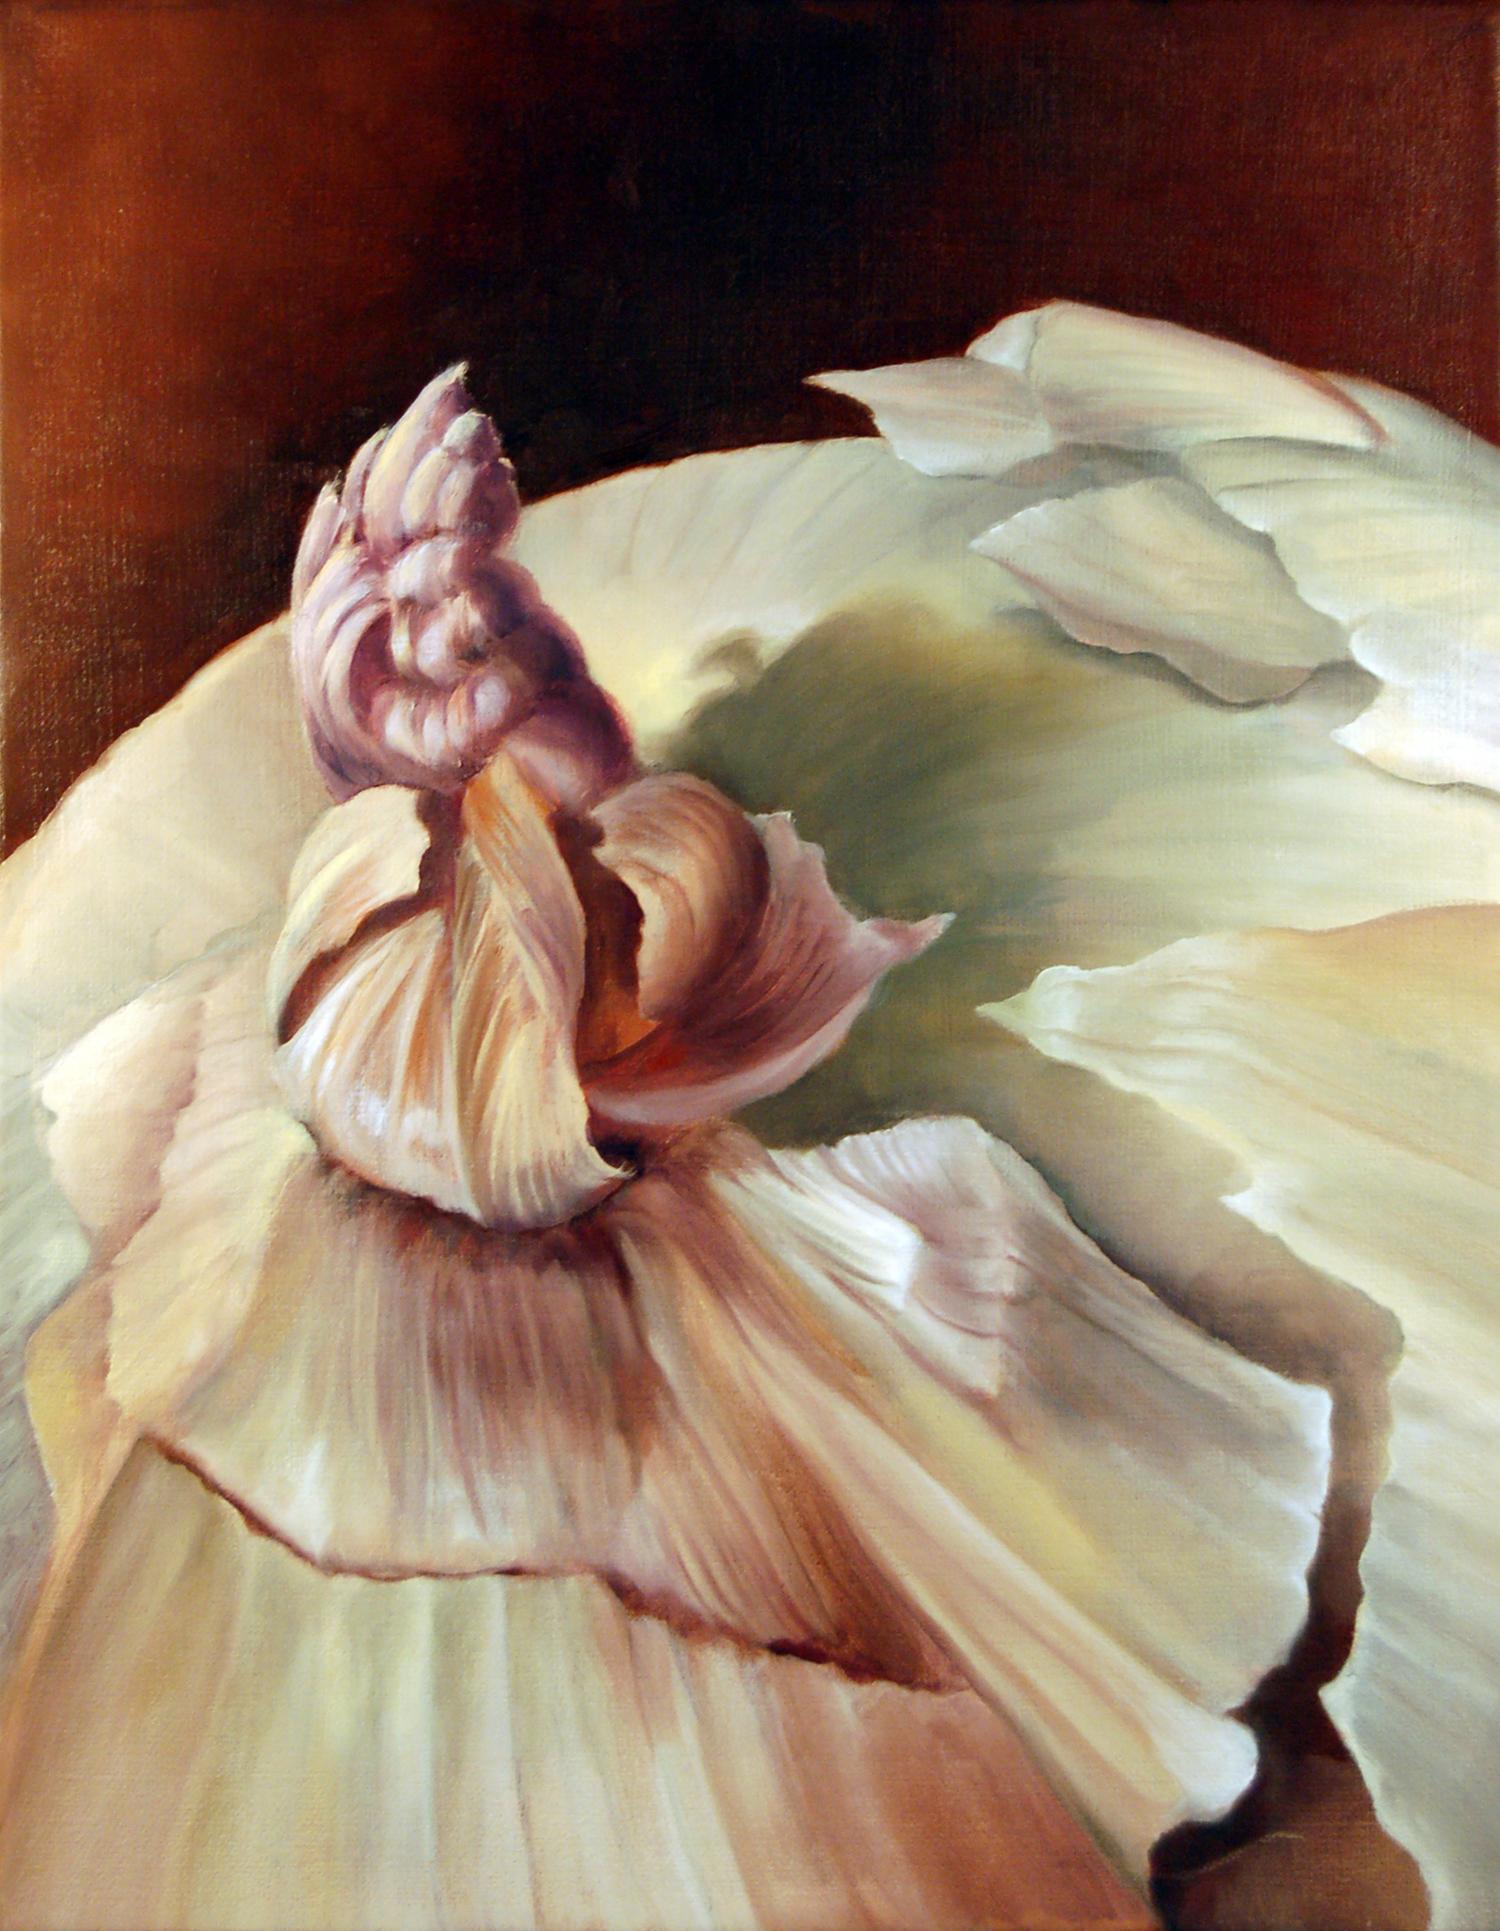 Ruminations on Mortality: Onion 2